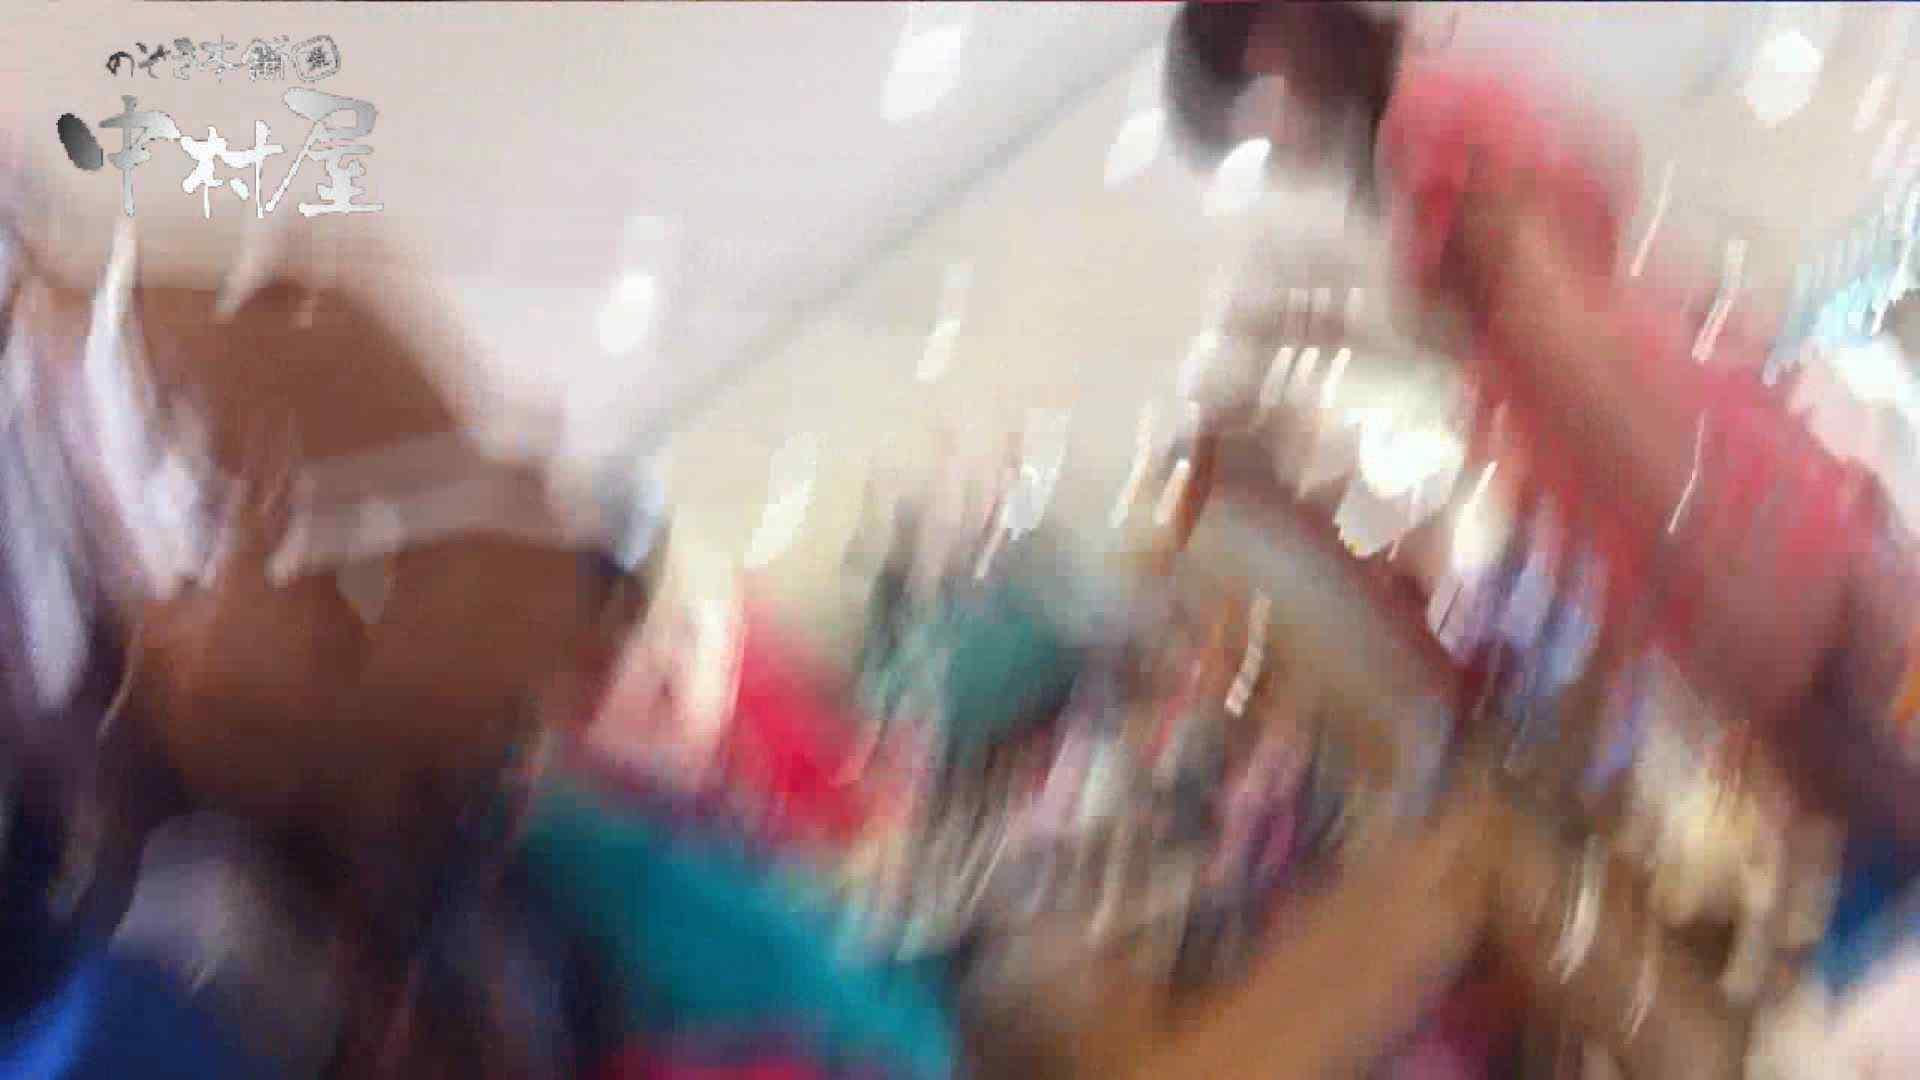 vol.52 美人アパレル胸チラ&パンチラ おとなしそうな店員の胸元にアタック! 接写 盗撮ワレメ無修正動画無料 86画像 43